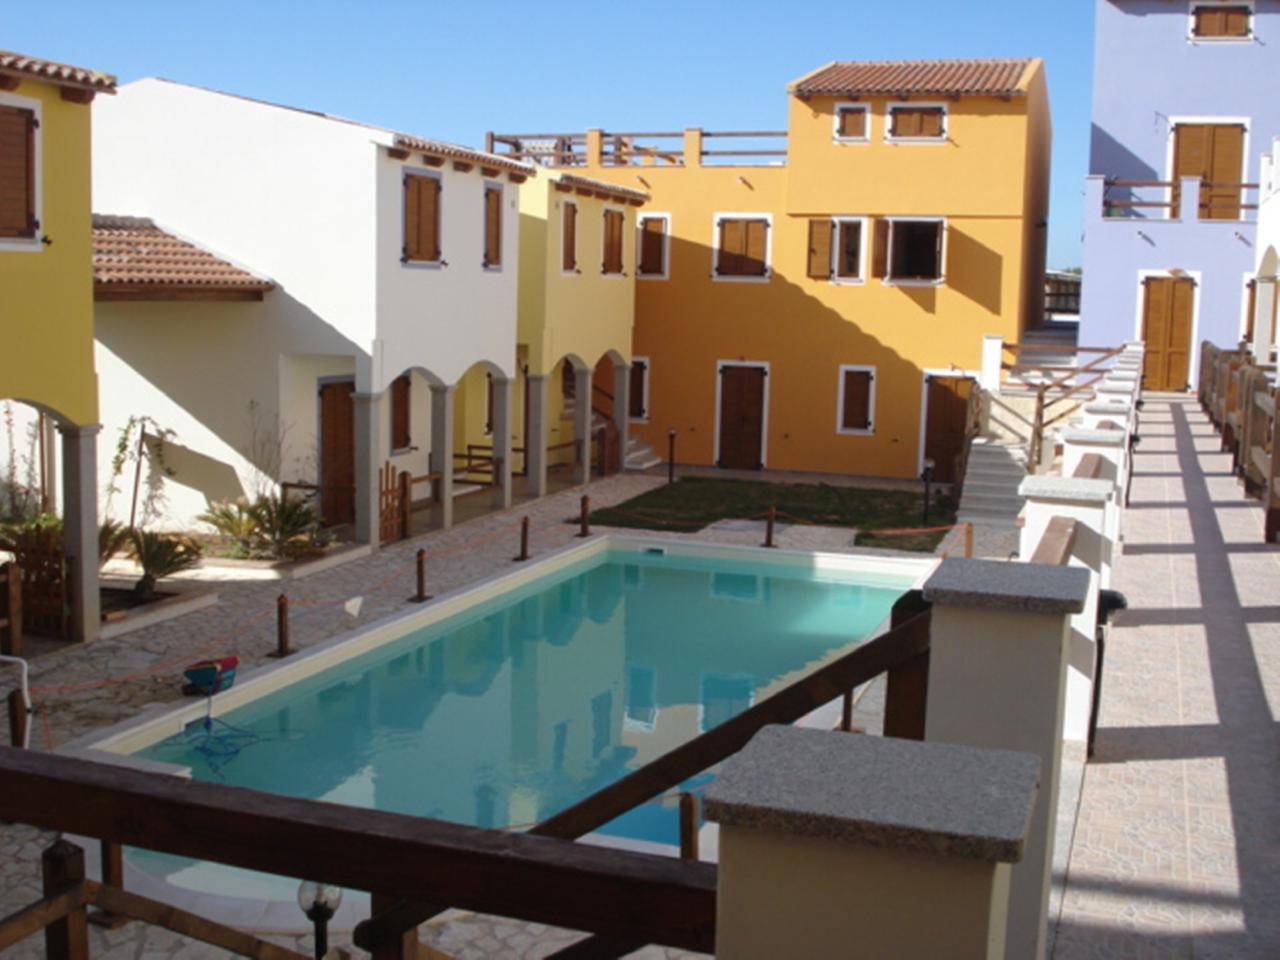 Ferienwohnung Residence Li Duni con piscina (2626686), Viddalba, Sassari, Sardinien, Italien, Bild 3